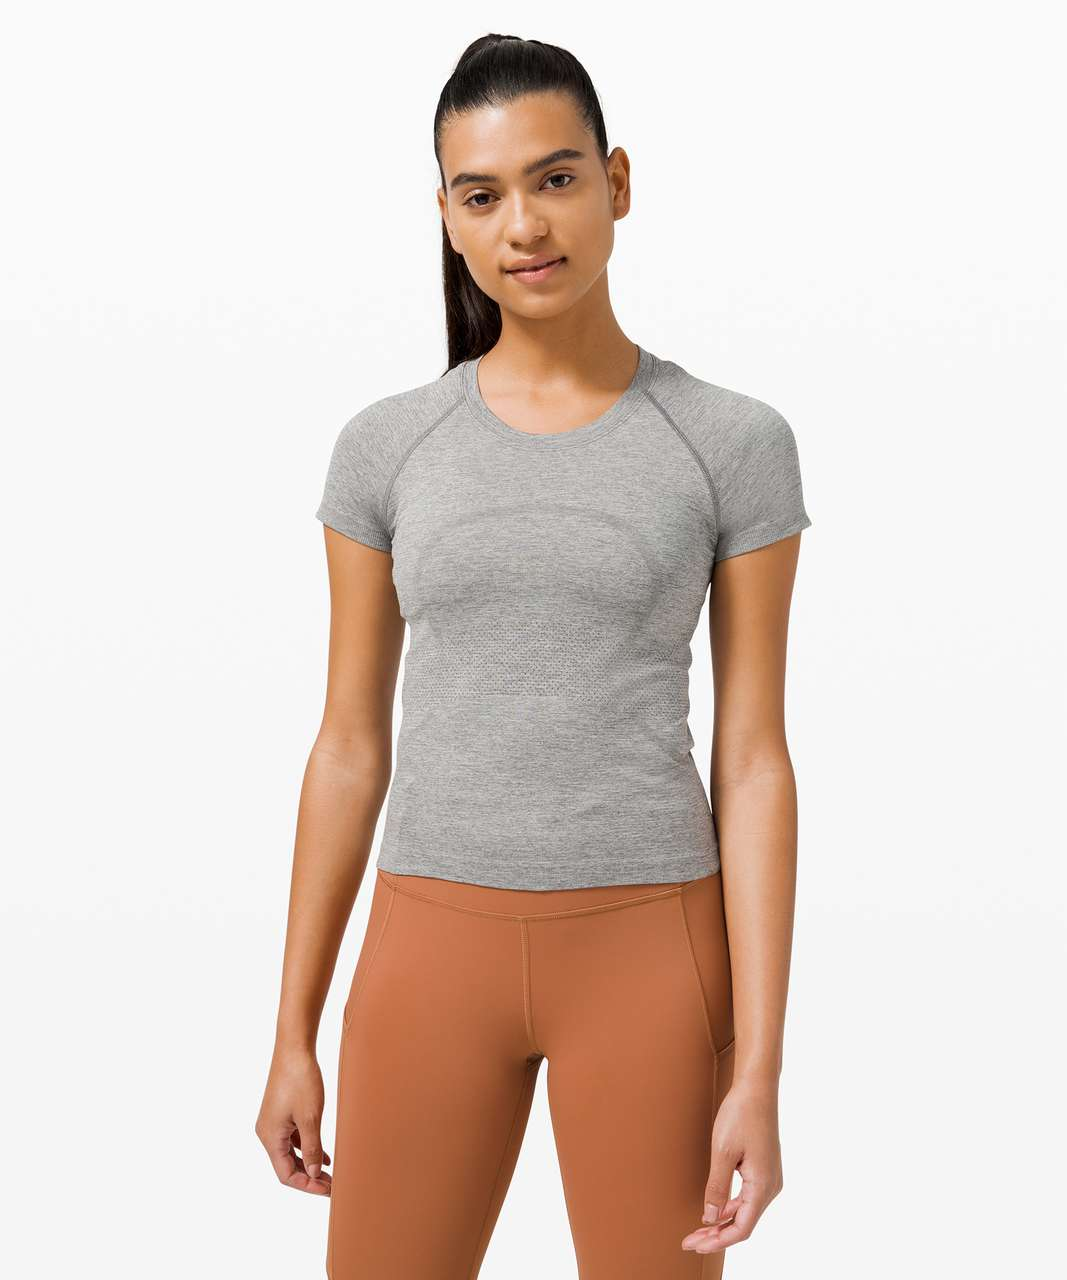 Lululemon Swiftly Tech Short Sleeve 2.0 *Race Length - Slate / White